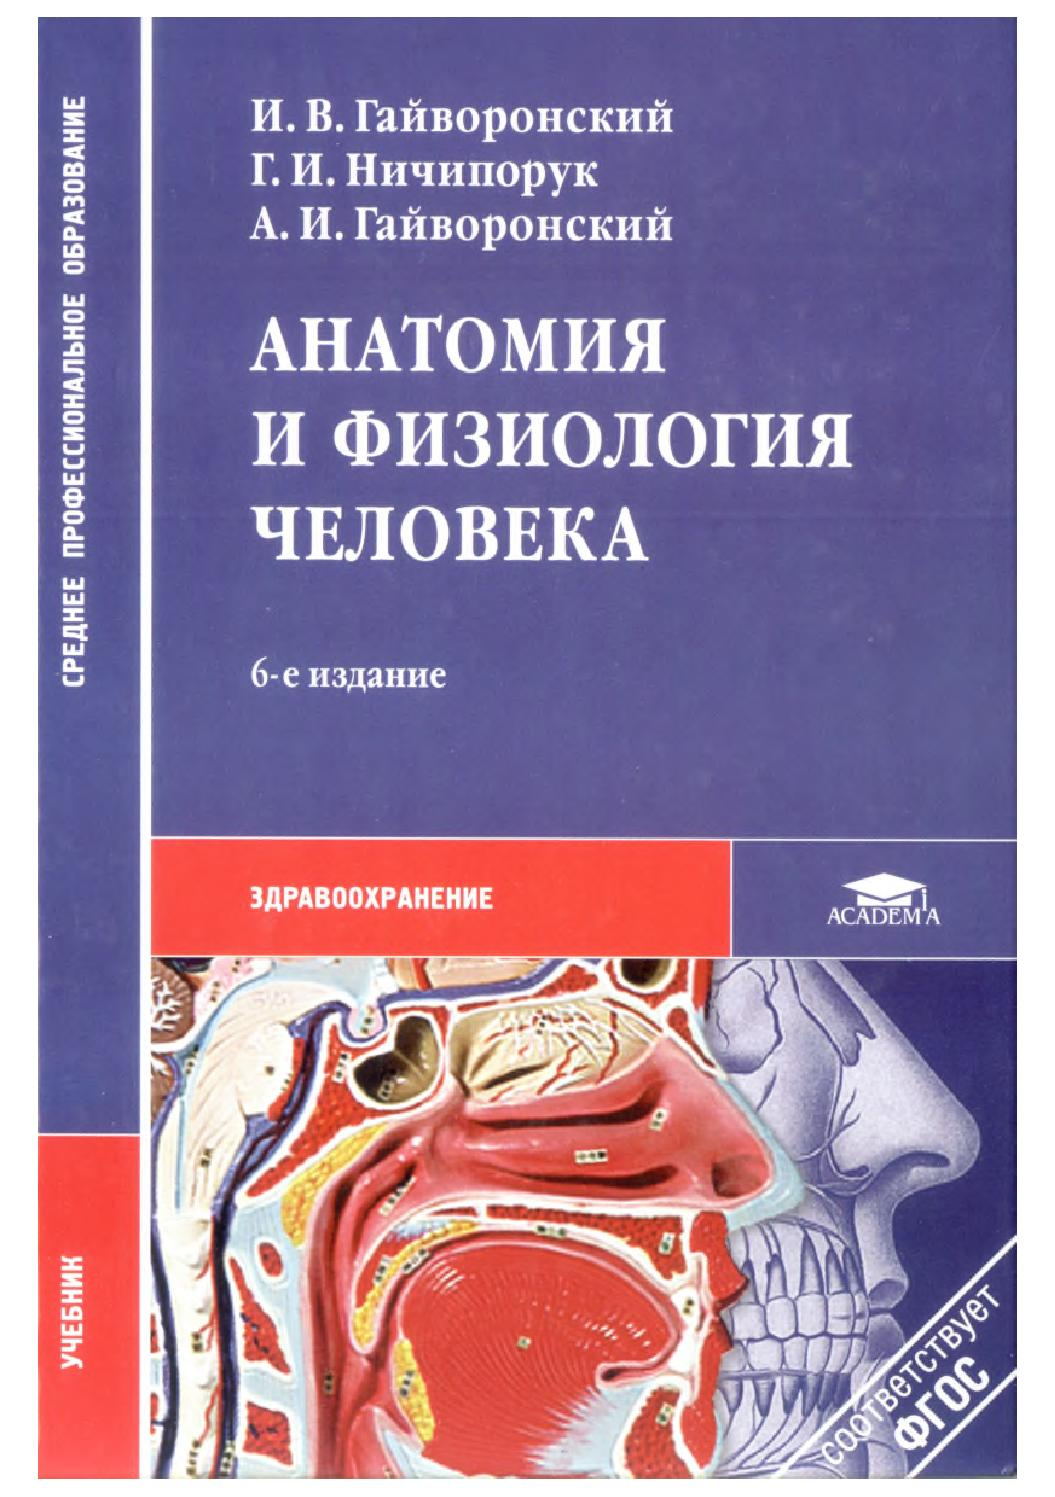 Учебник анатомии 1974 года под ред привеса 672 с 17 5 x 26 5 см уже 8-е издание